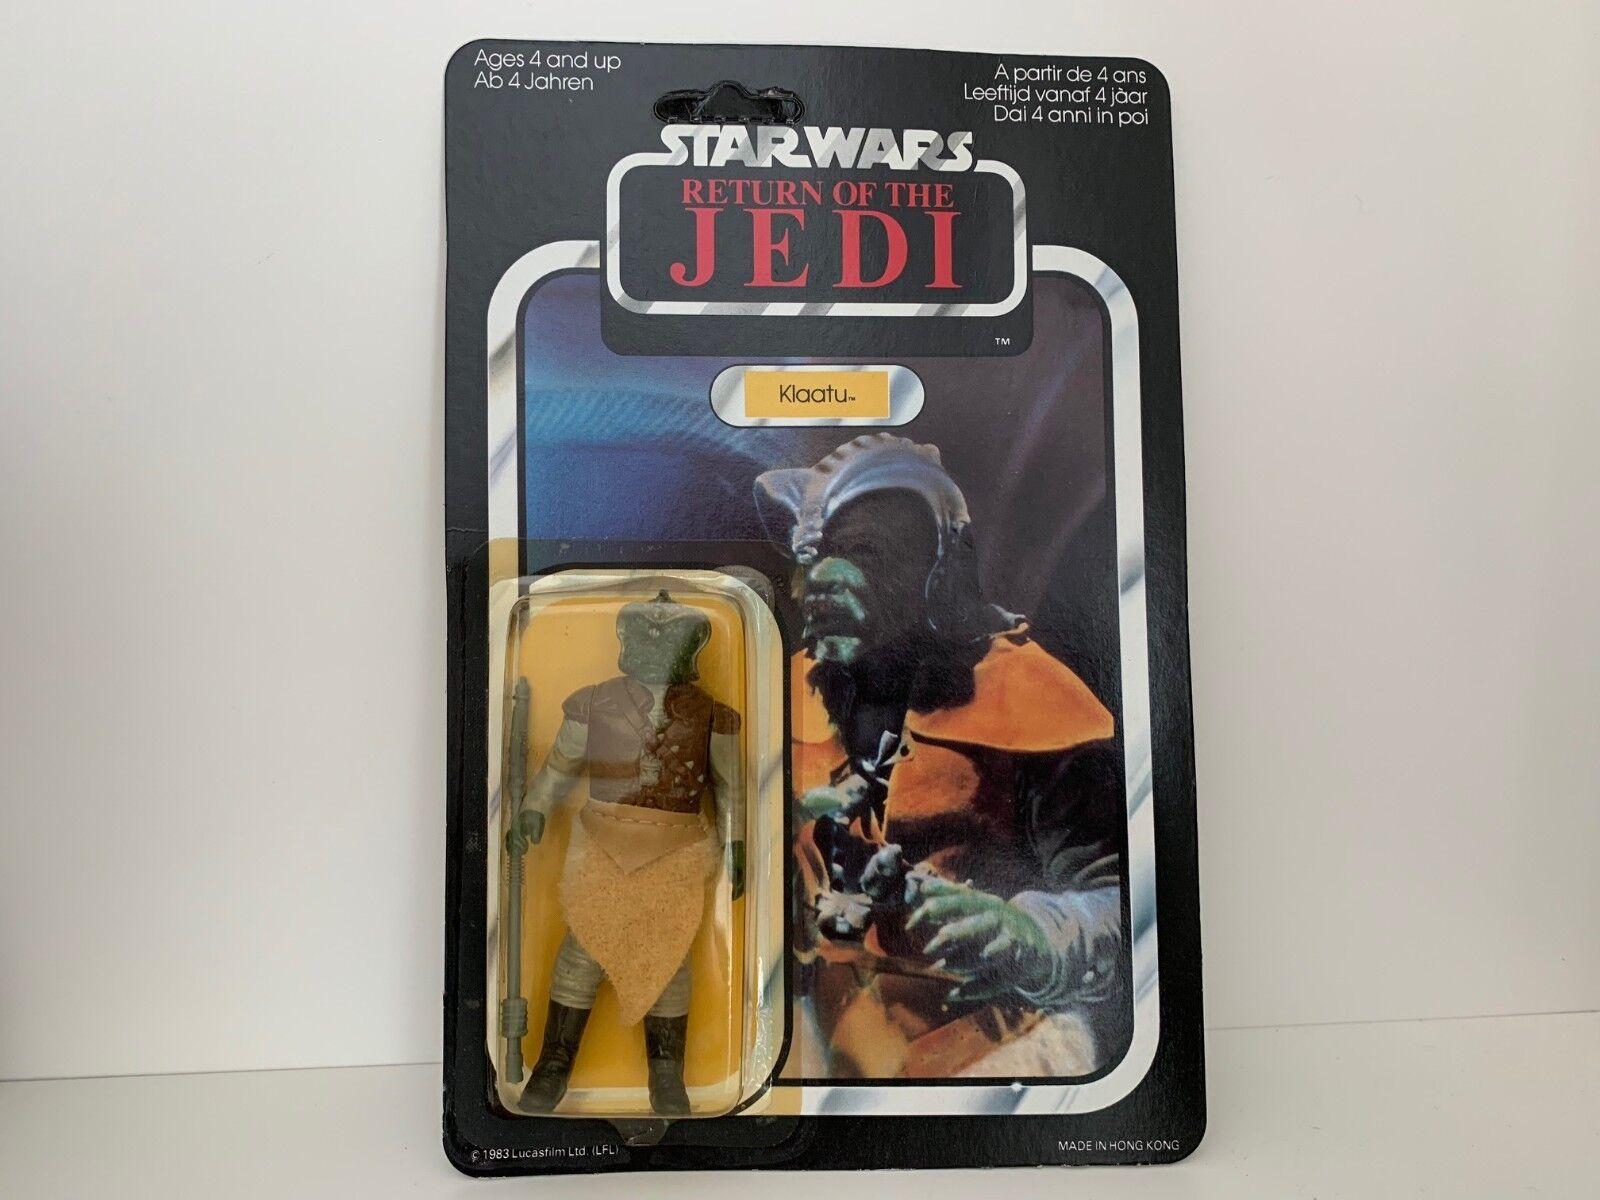 Original De Star Wars Vintage 2018 Rotj Palitoy 65 Back ENLOMADOR HK Klaatu